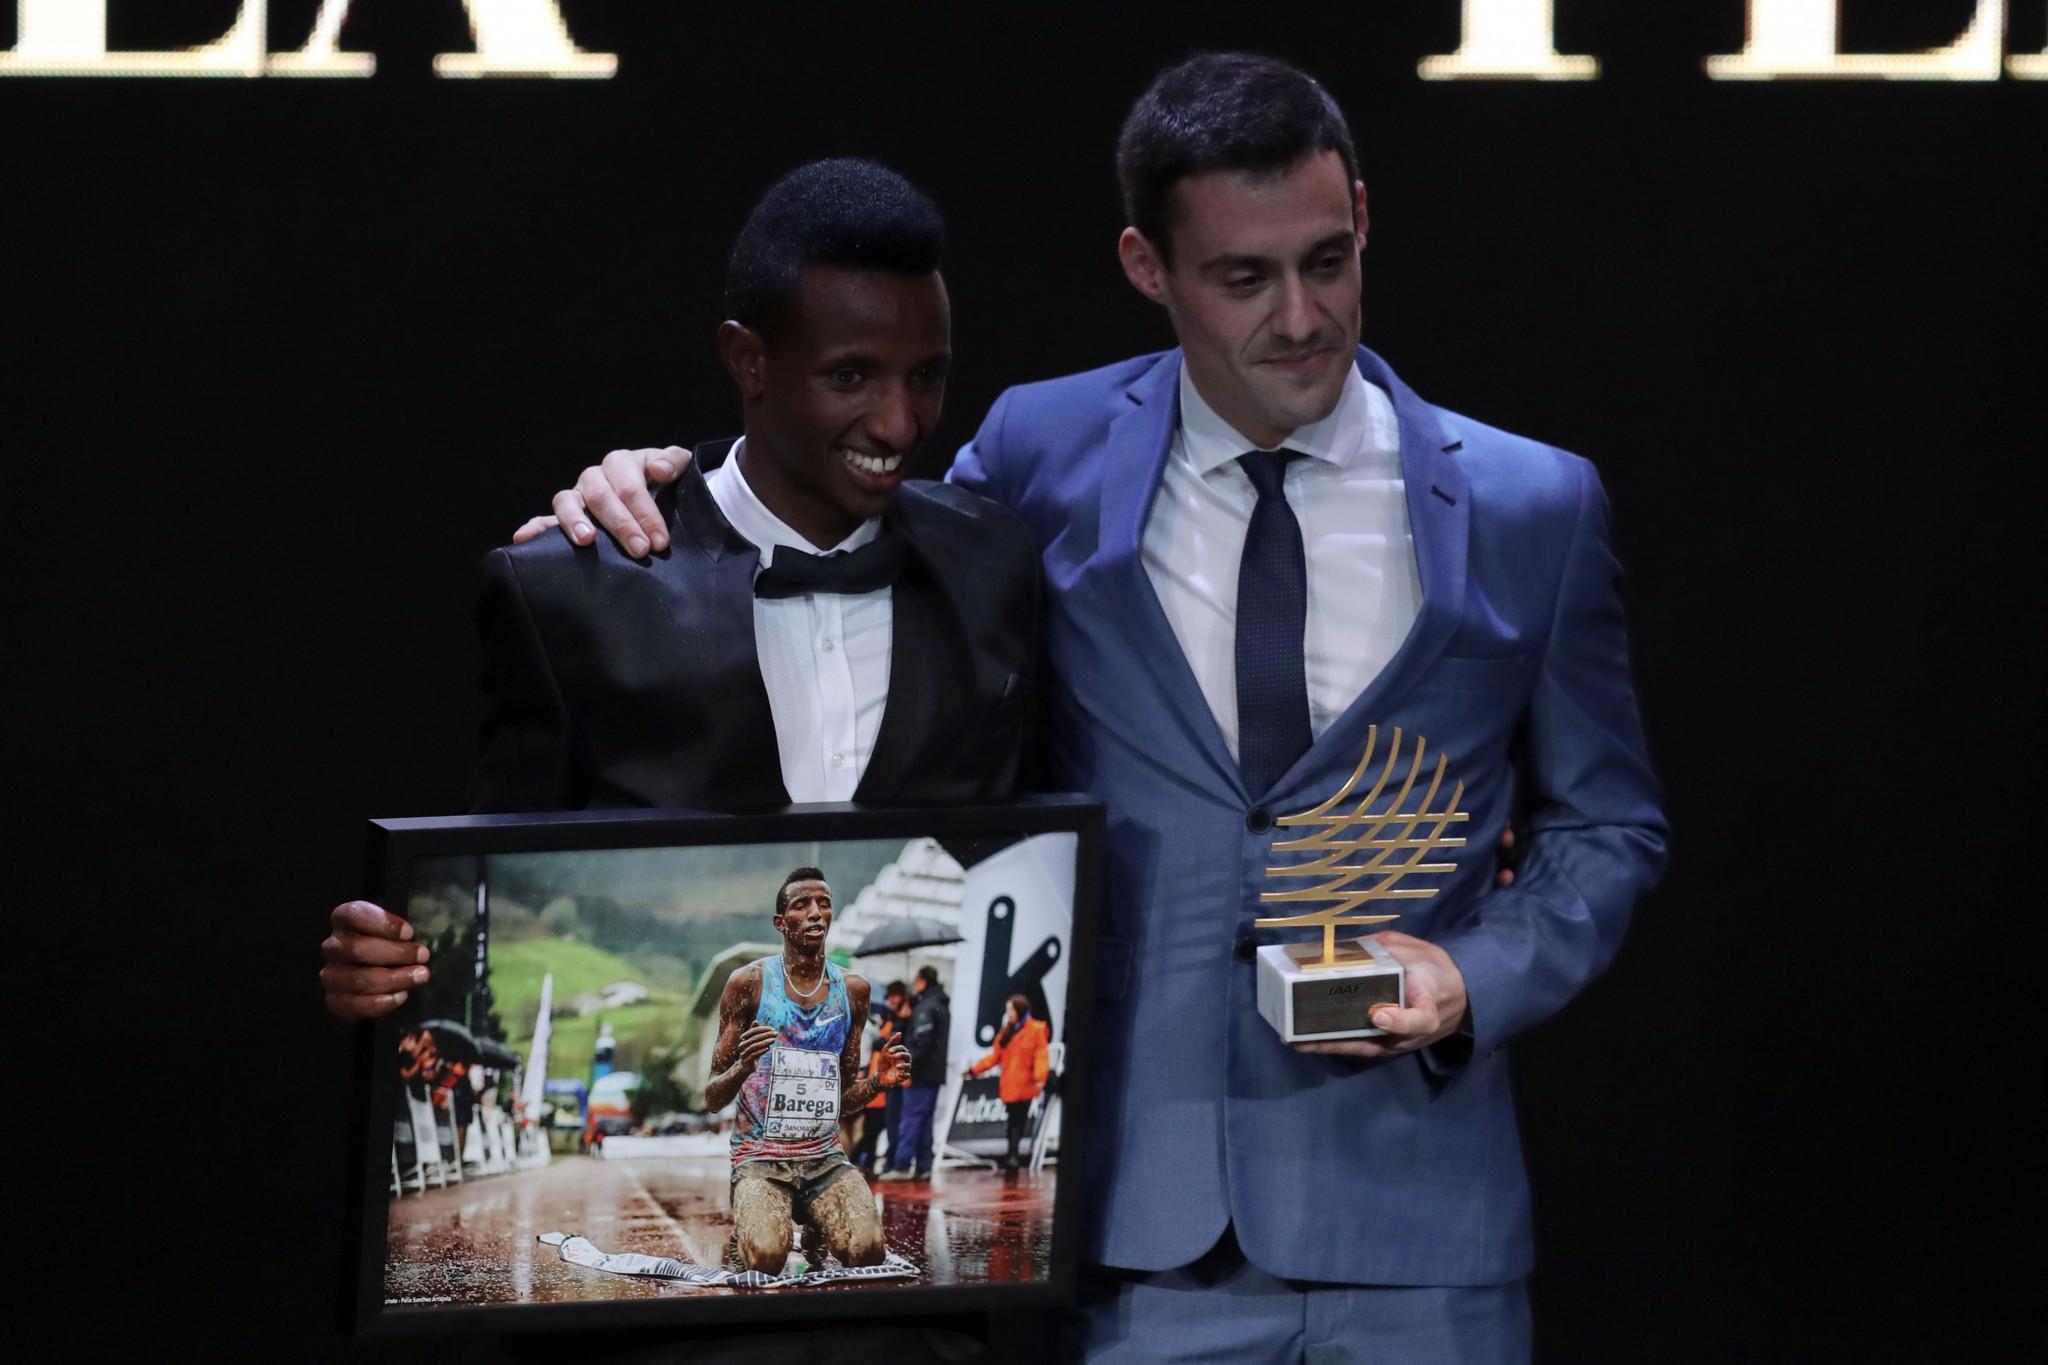 Barega seeks repeat victory at IAAF Cross Country Permit race in Elgoibar